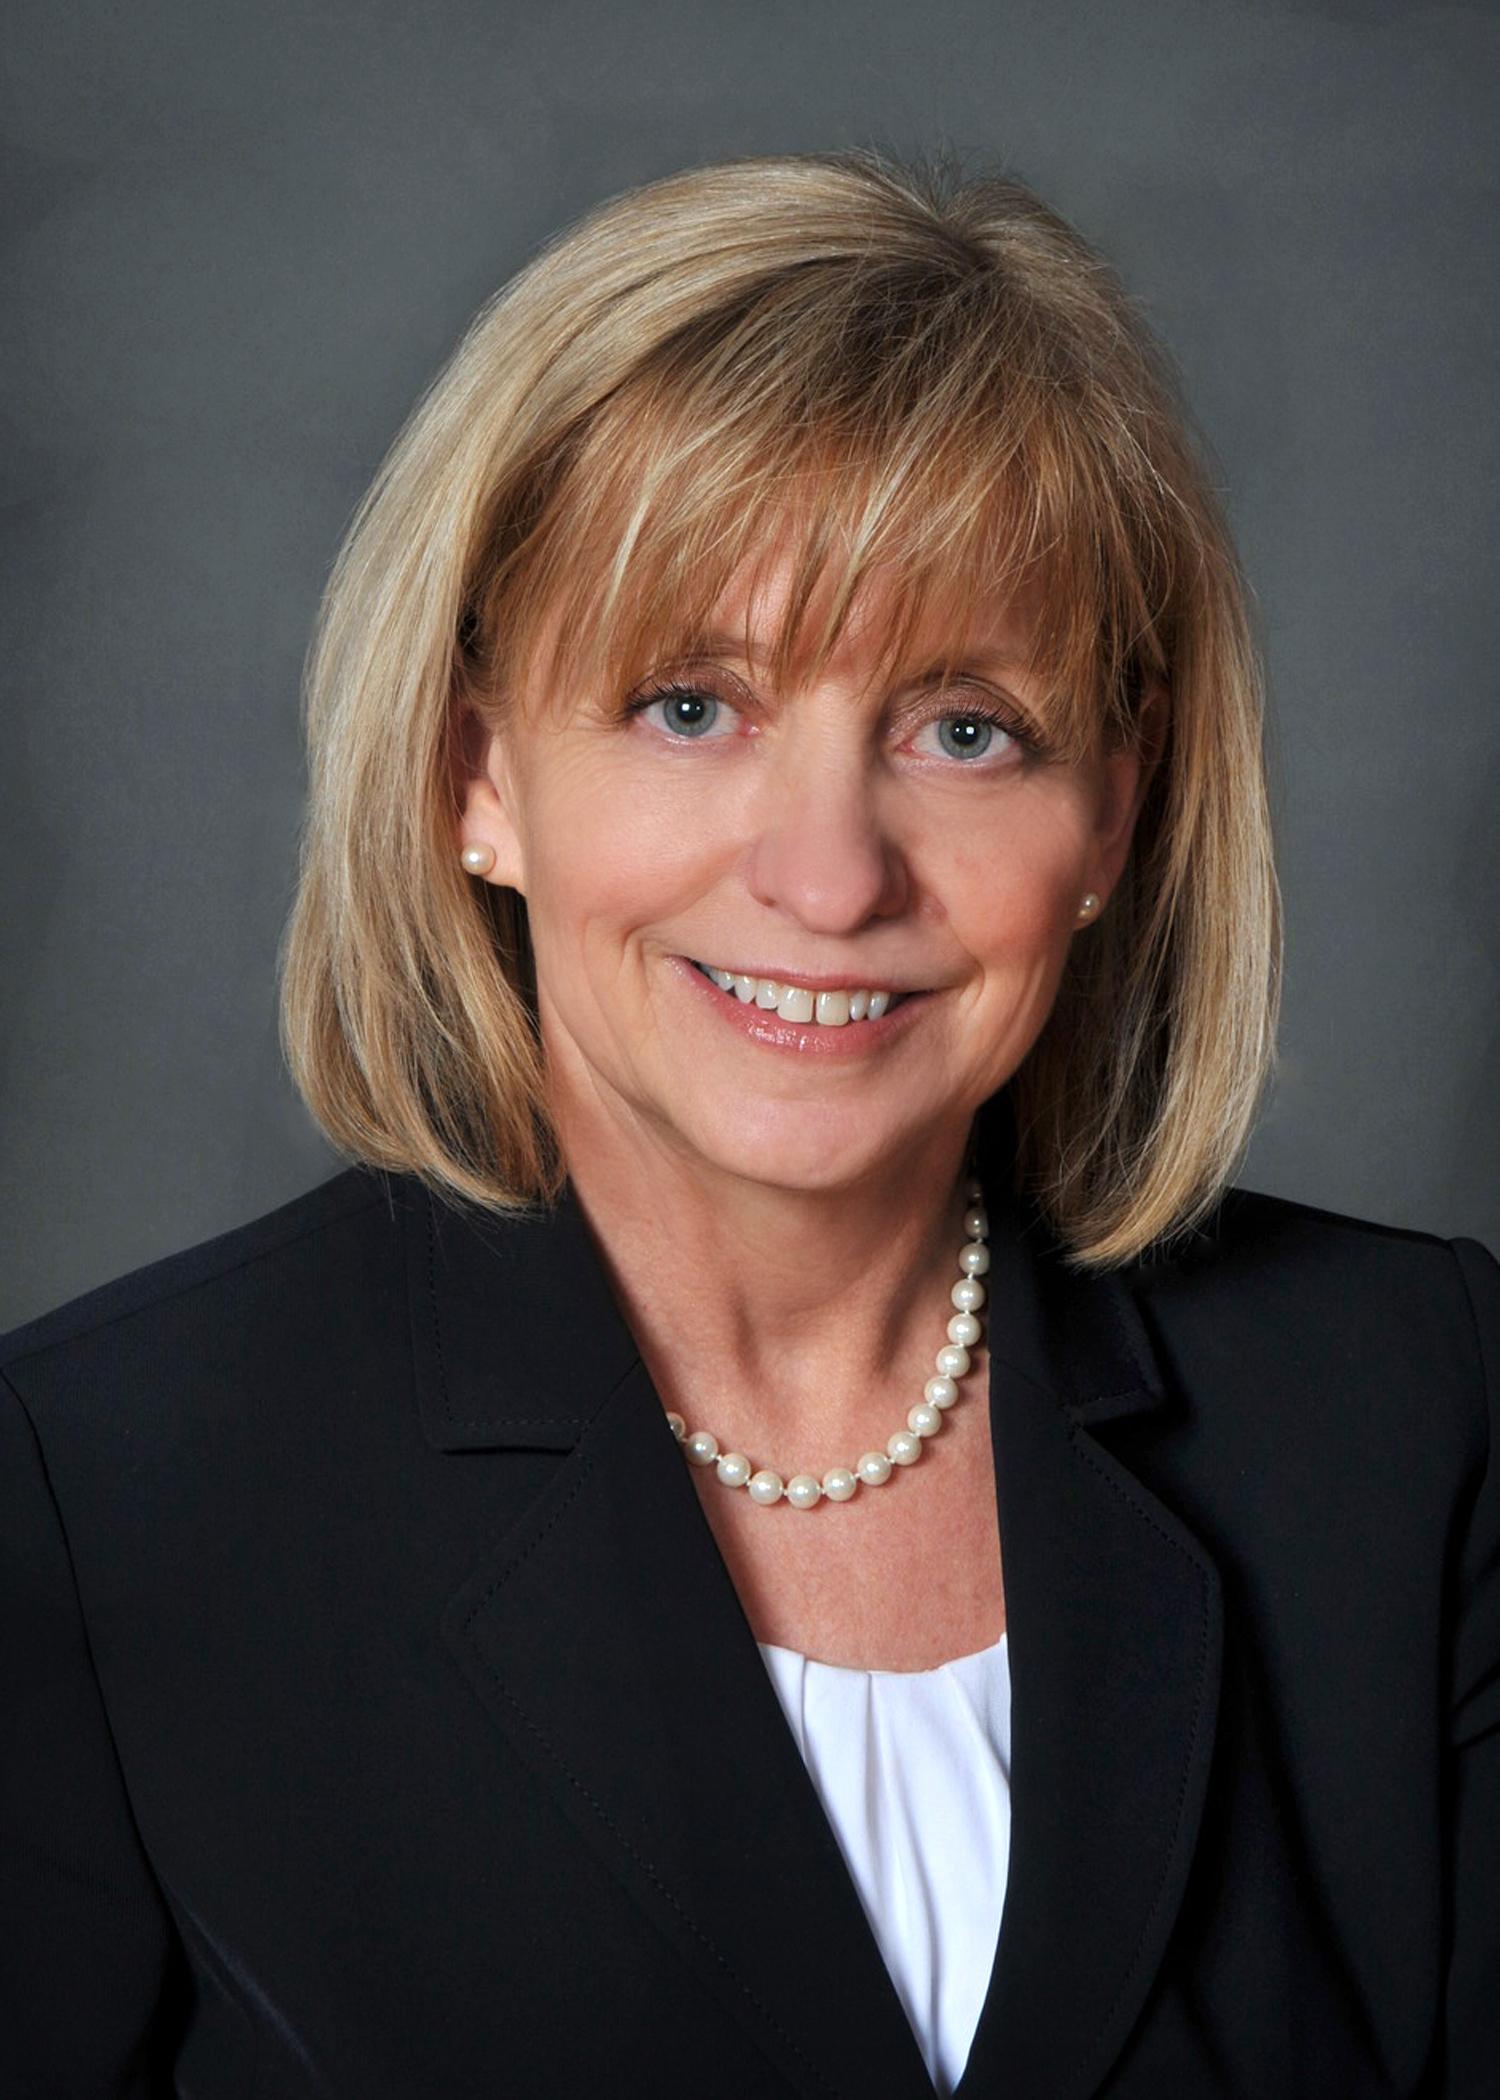 Darlene R. Dahl